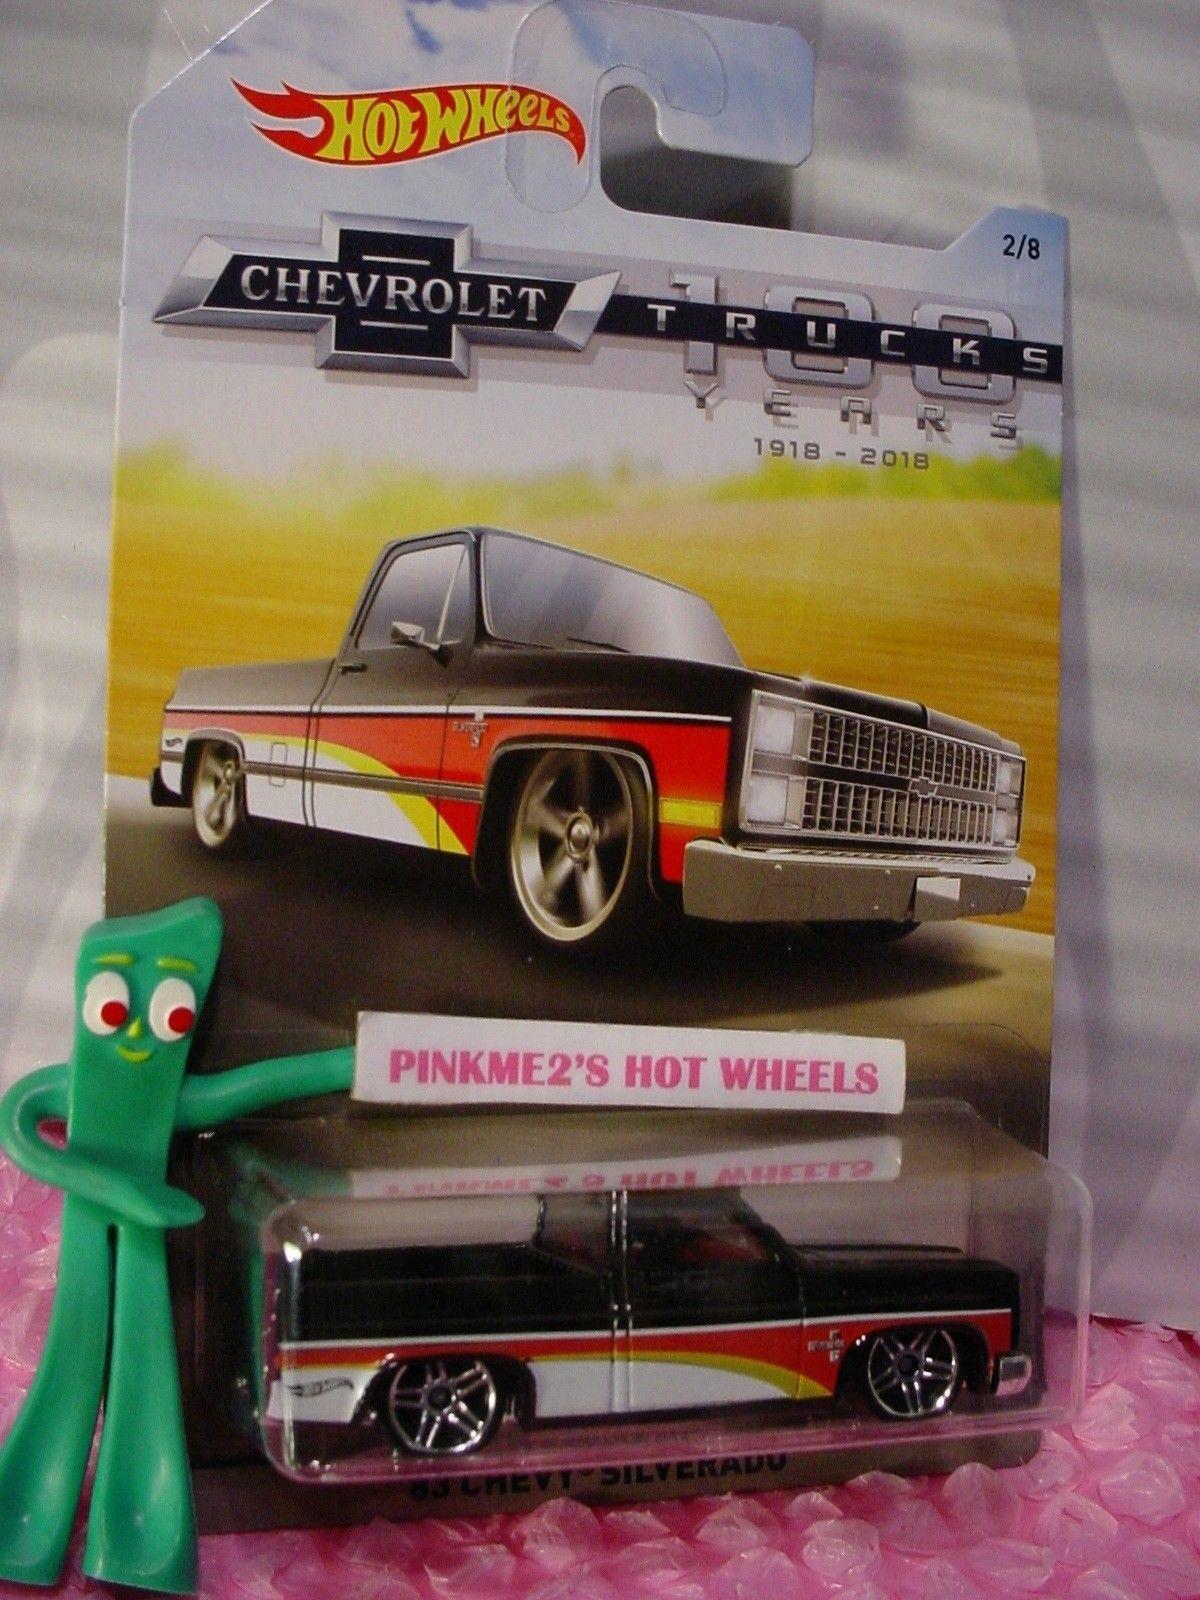 Hot Wheels 2018 Chevrolet 100 years Trucks series /'83 CHEVY SILVERADO black